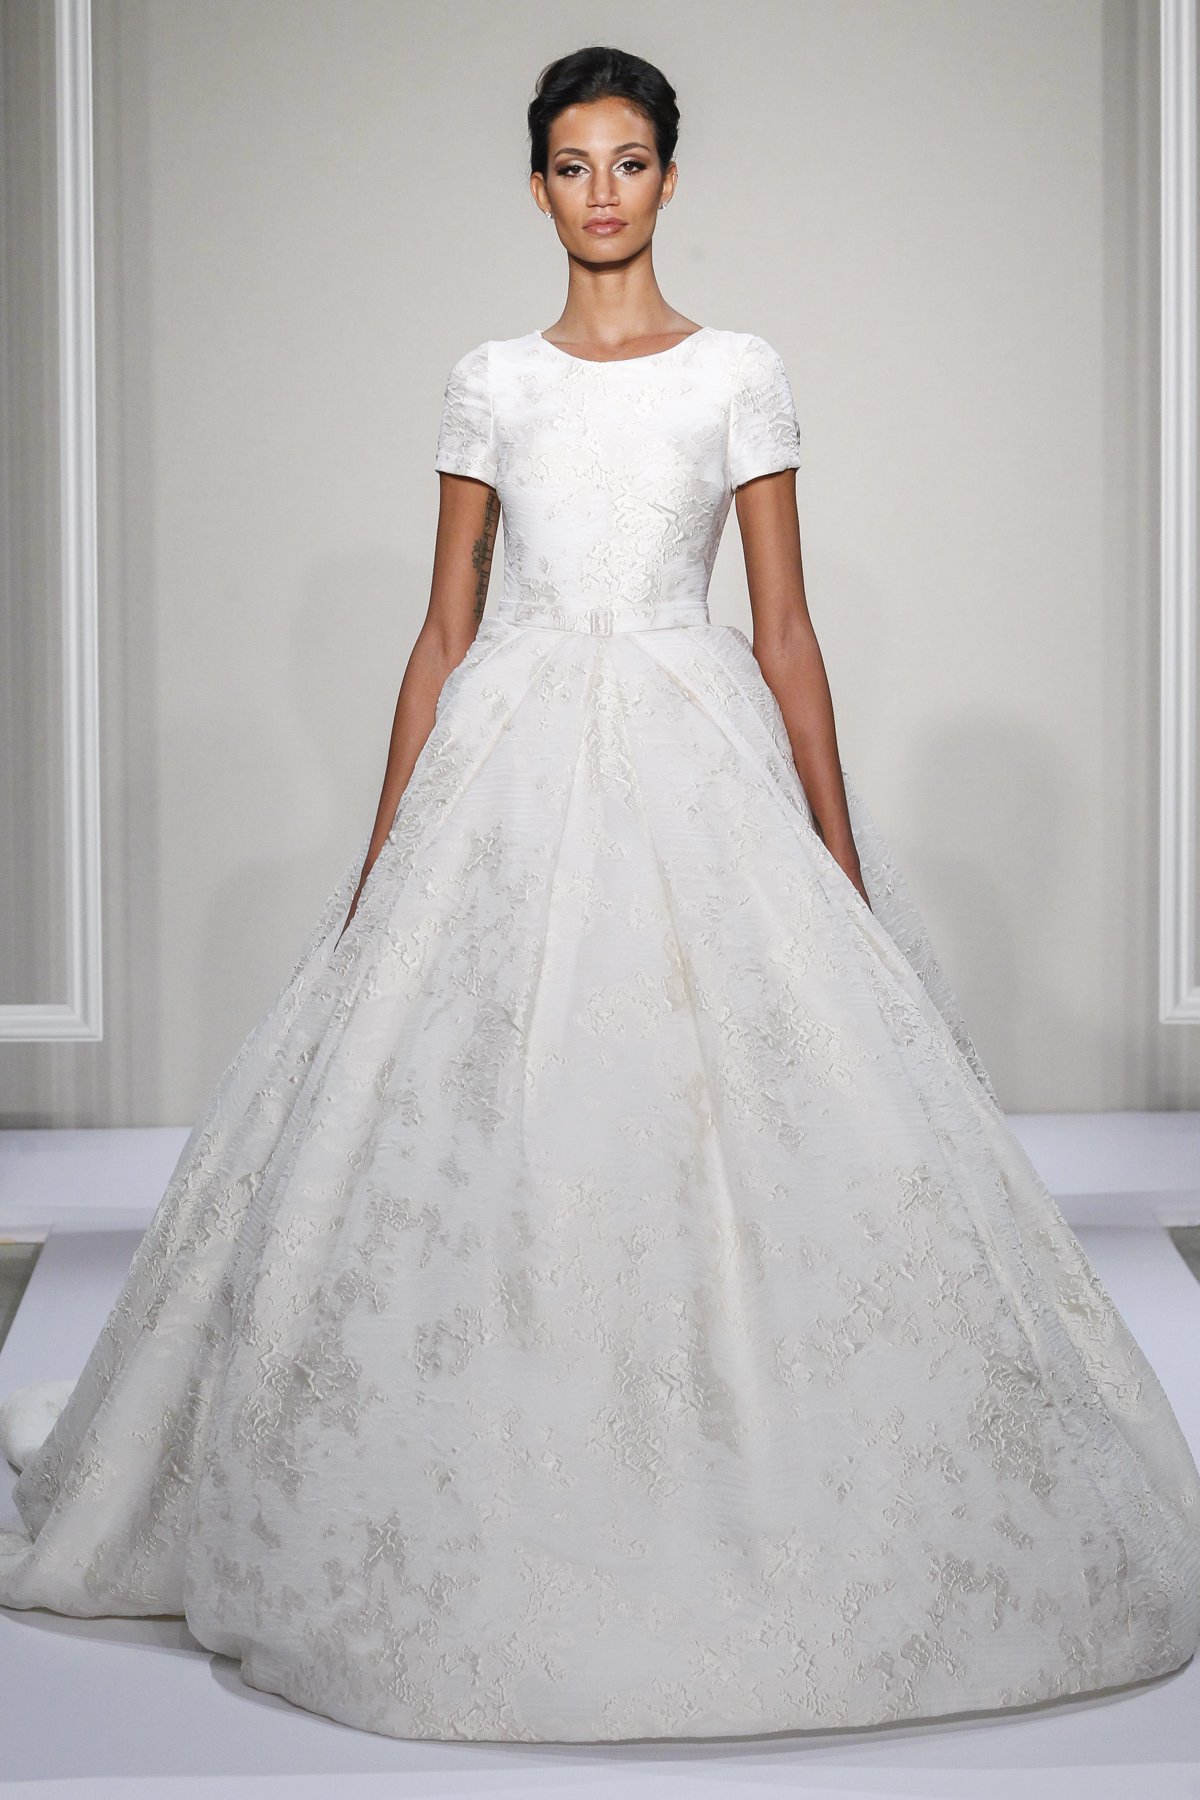 silk ball gown wedding dresses photo - 1